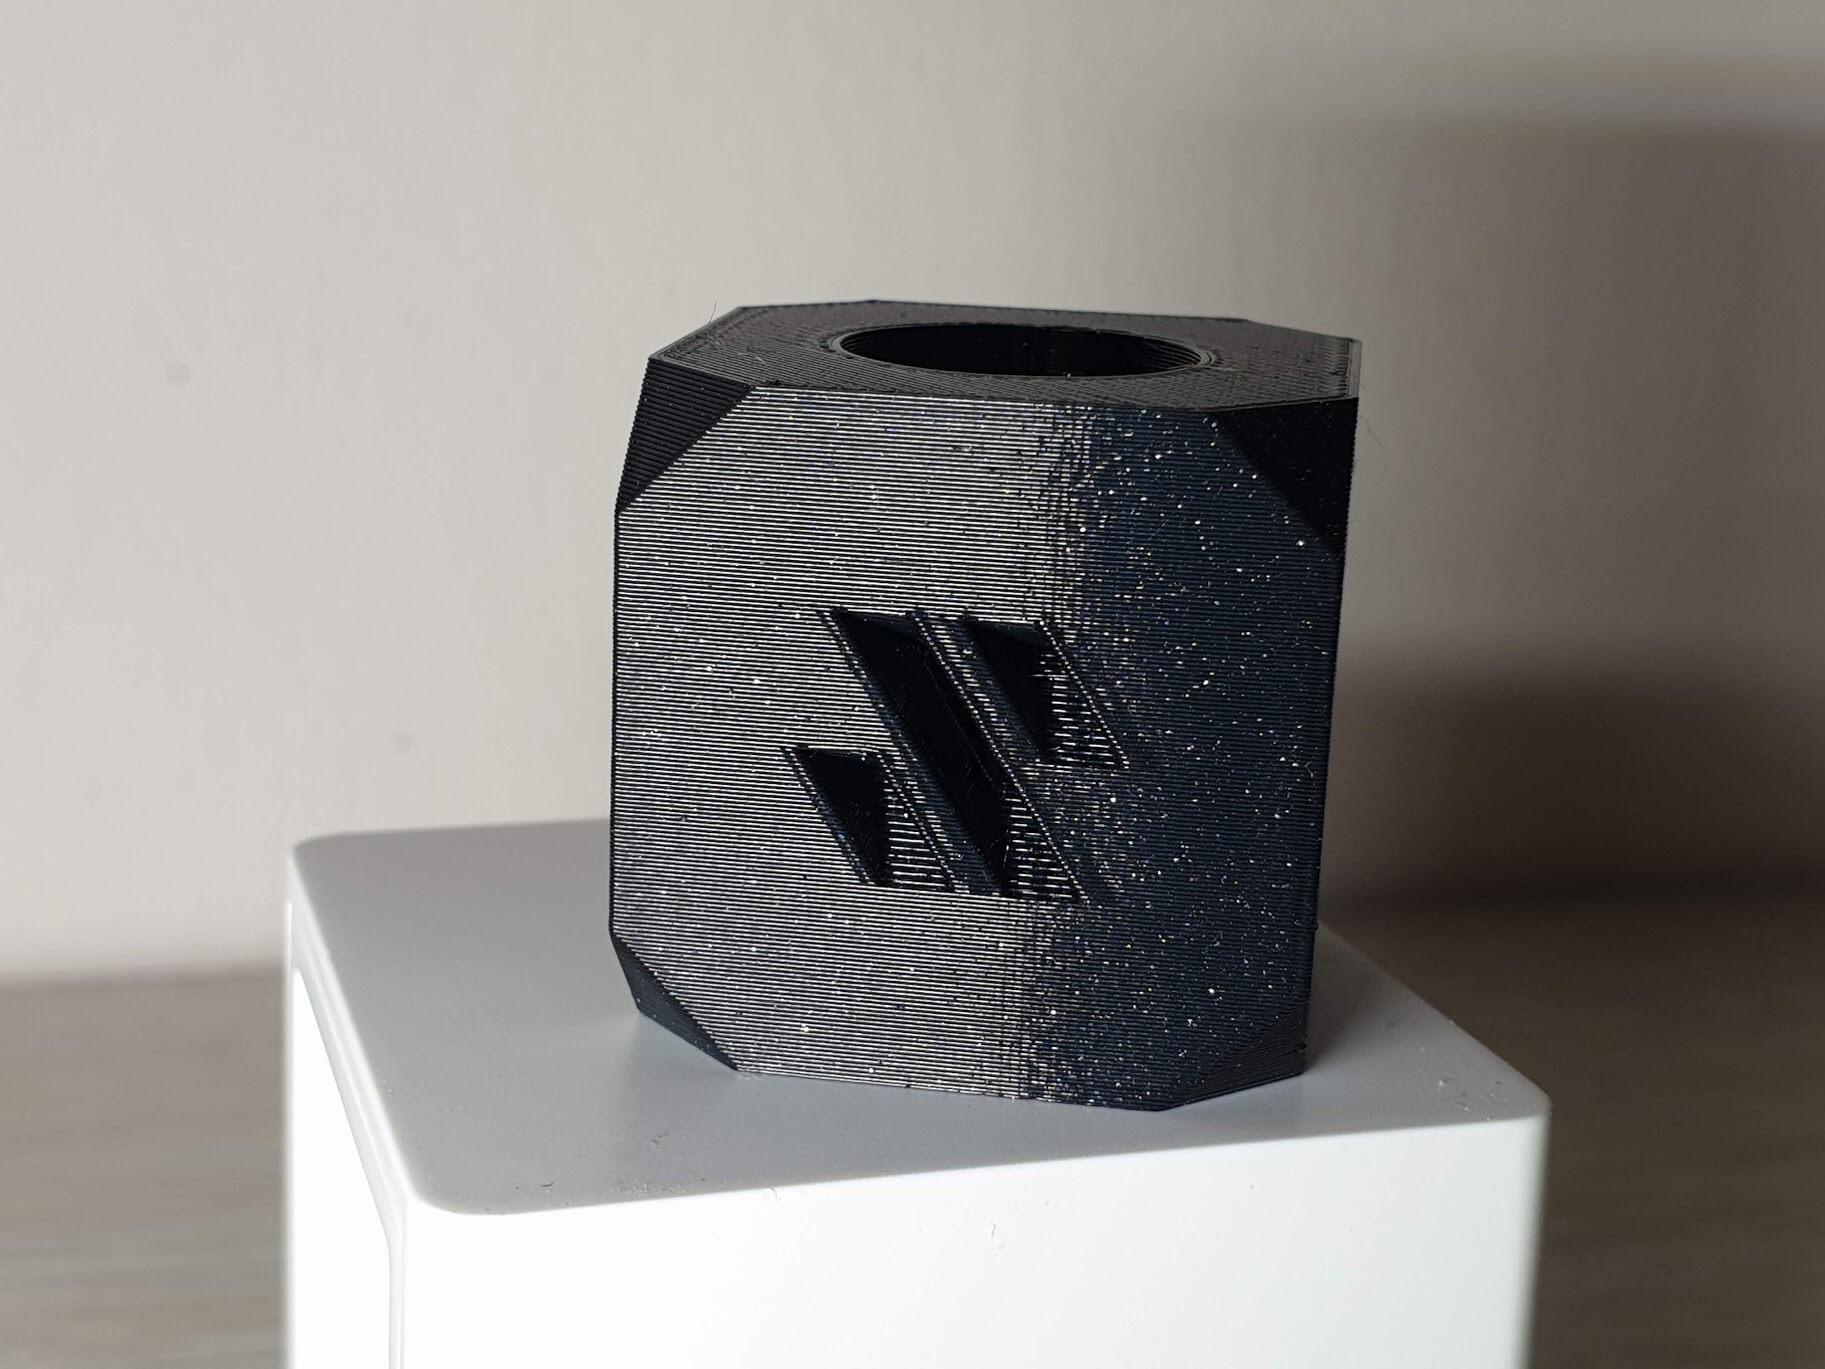 Voron Cube PETG IdeaMaker 4 | IdeaMaker Profiles for Sidewinder X1 and Genius